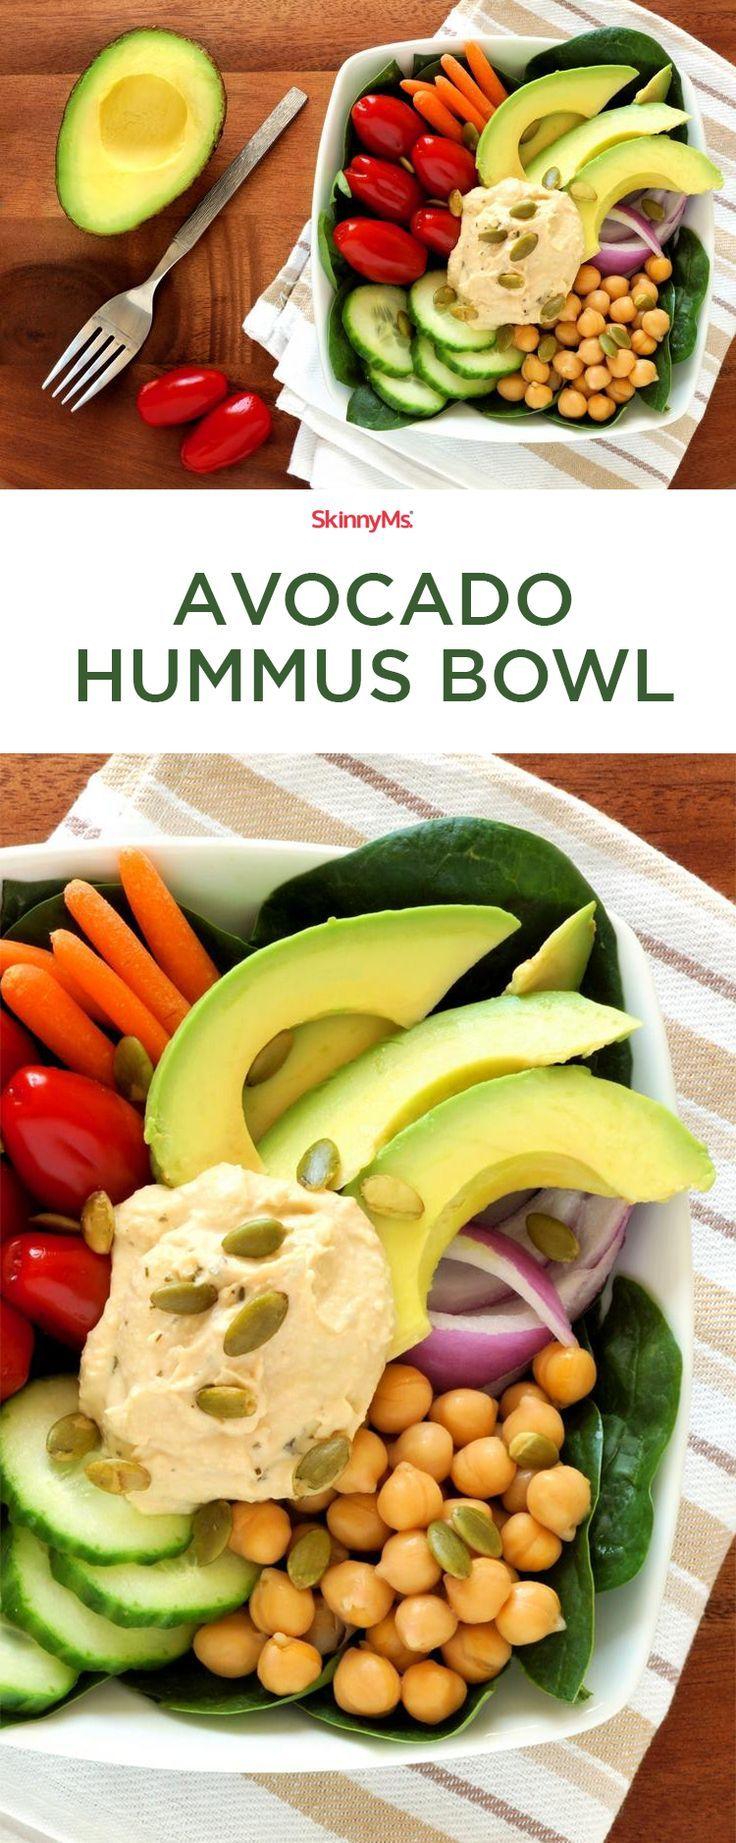 This Avocado Hummus Bowl is so flavorful and addictive! #skinnyms #hummus #yum